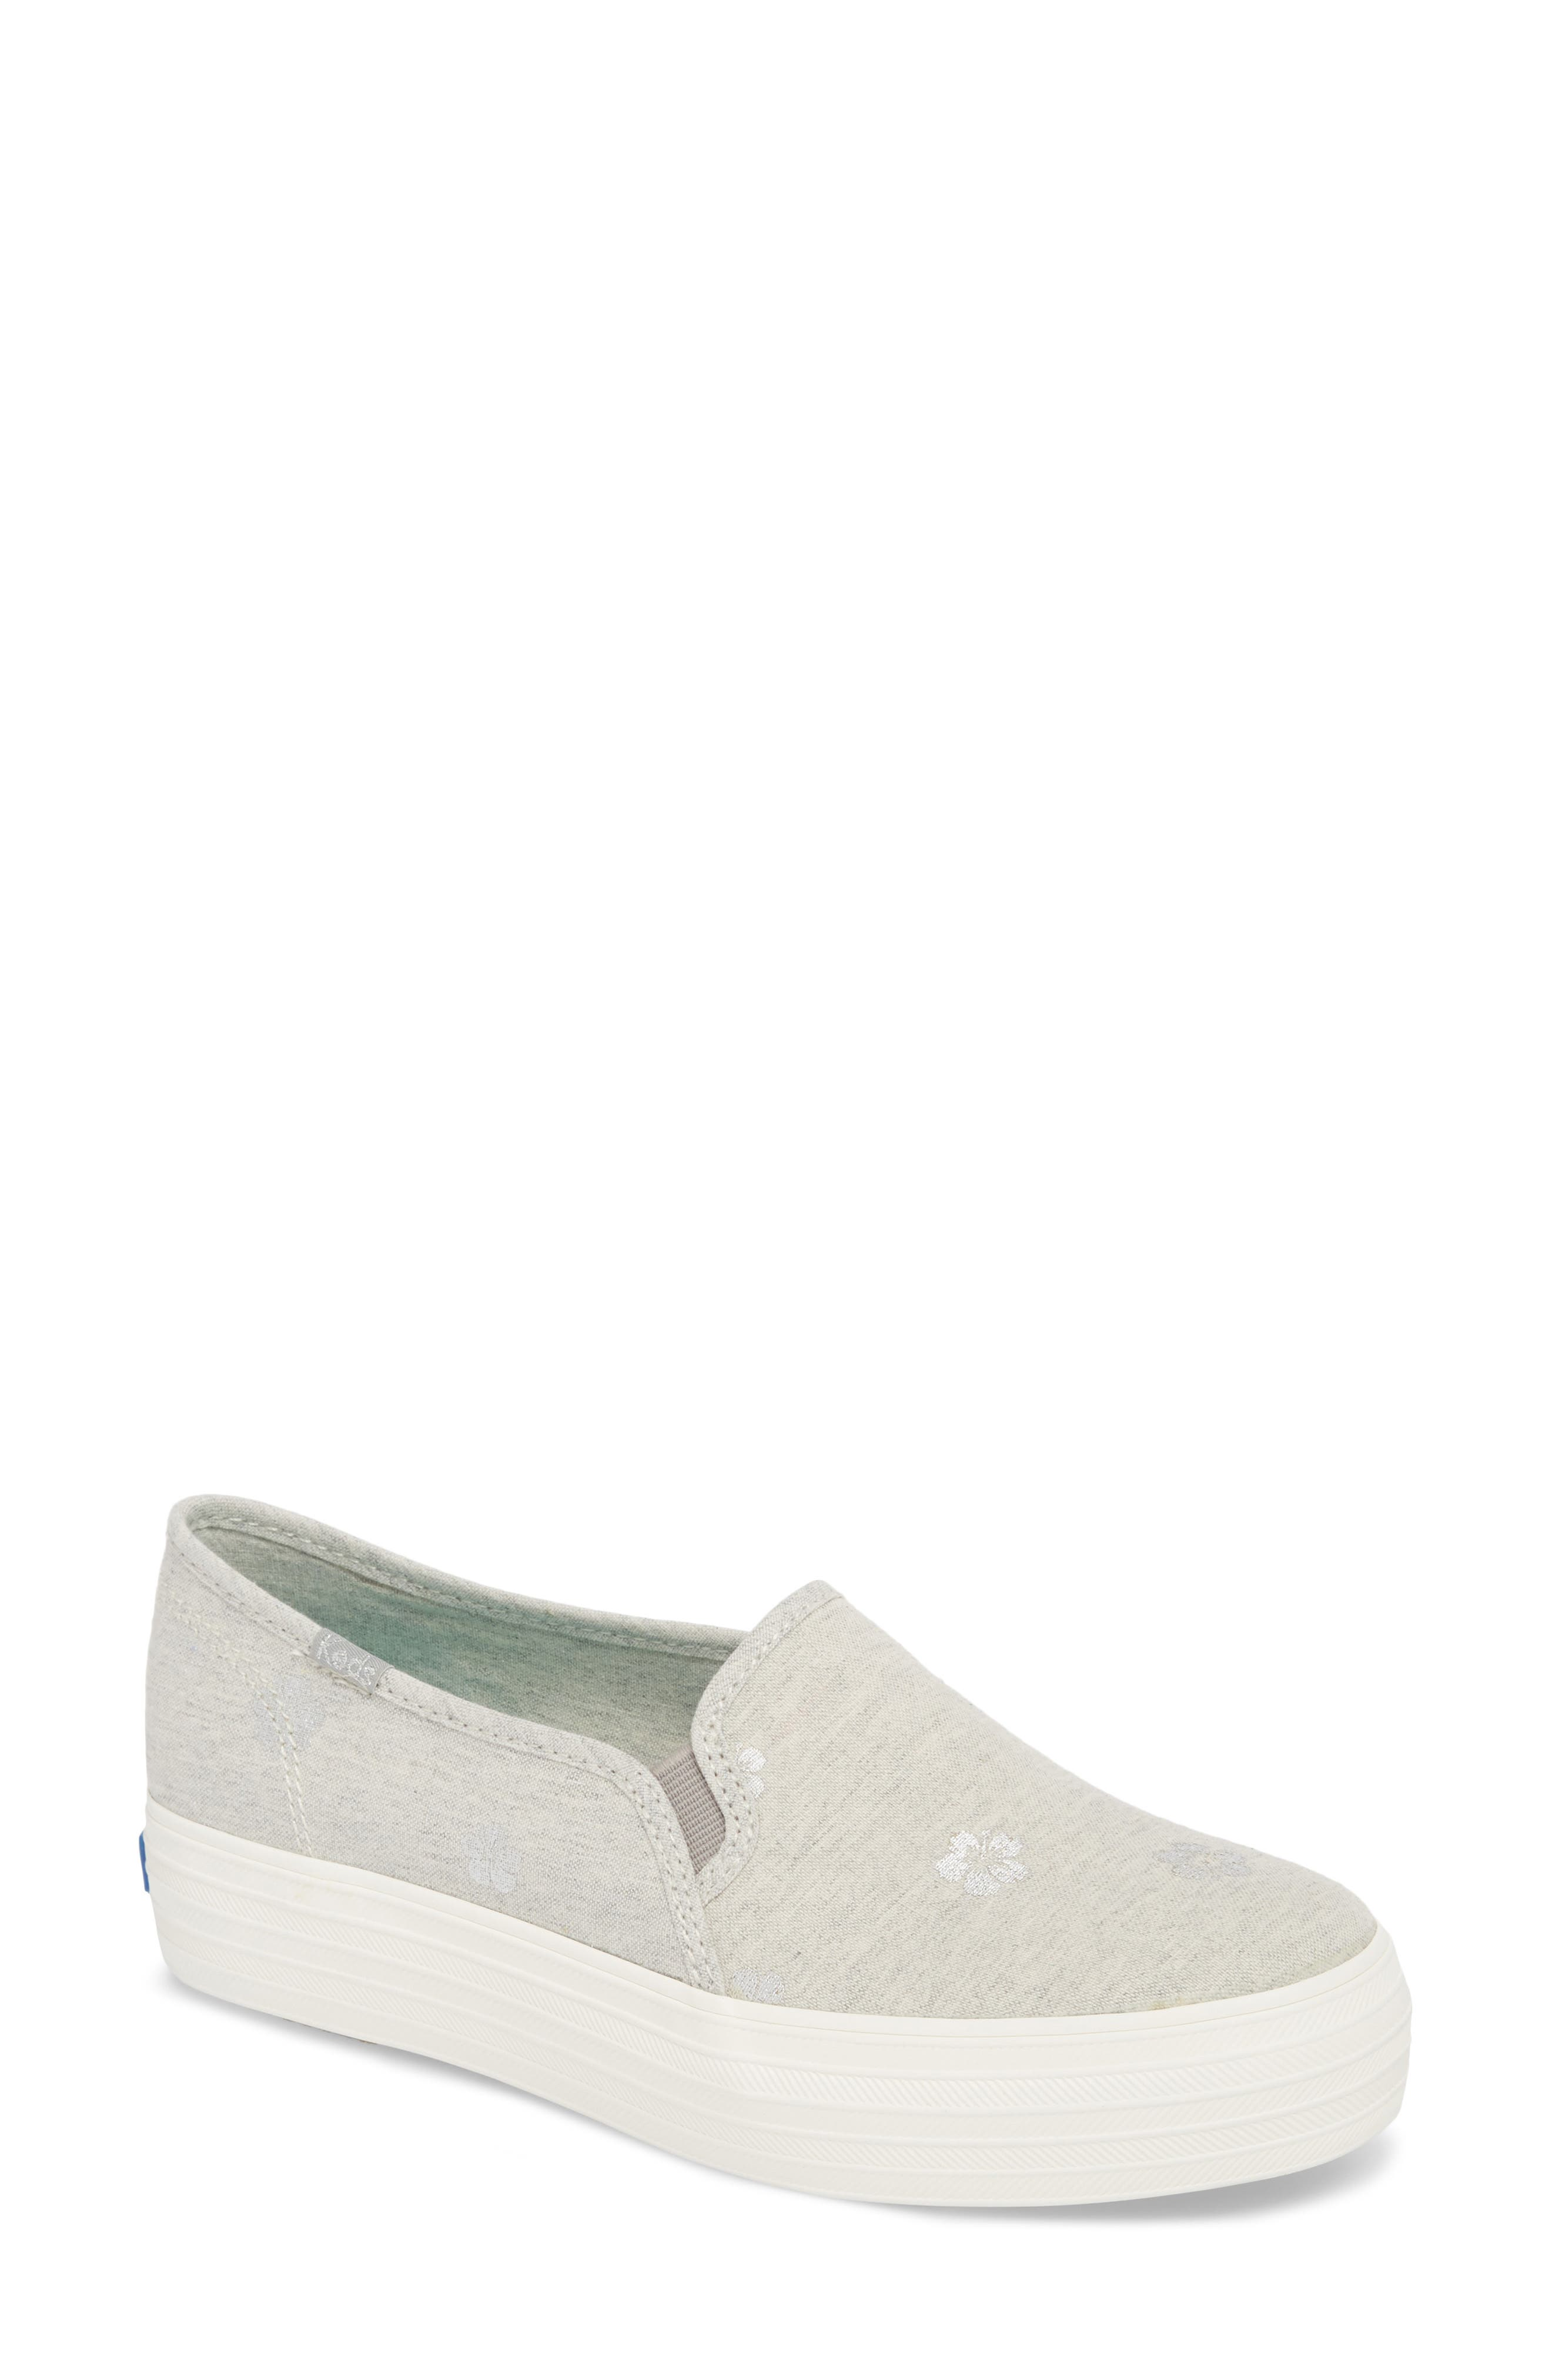 Triple Decker Hibiscus Slip-On Platform Sneaker,                             Main thumbnail 1, color,                             Light Grey